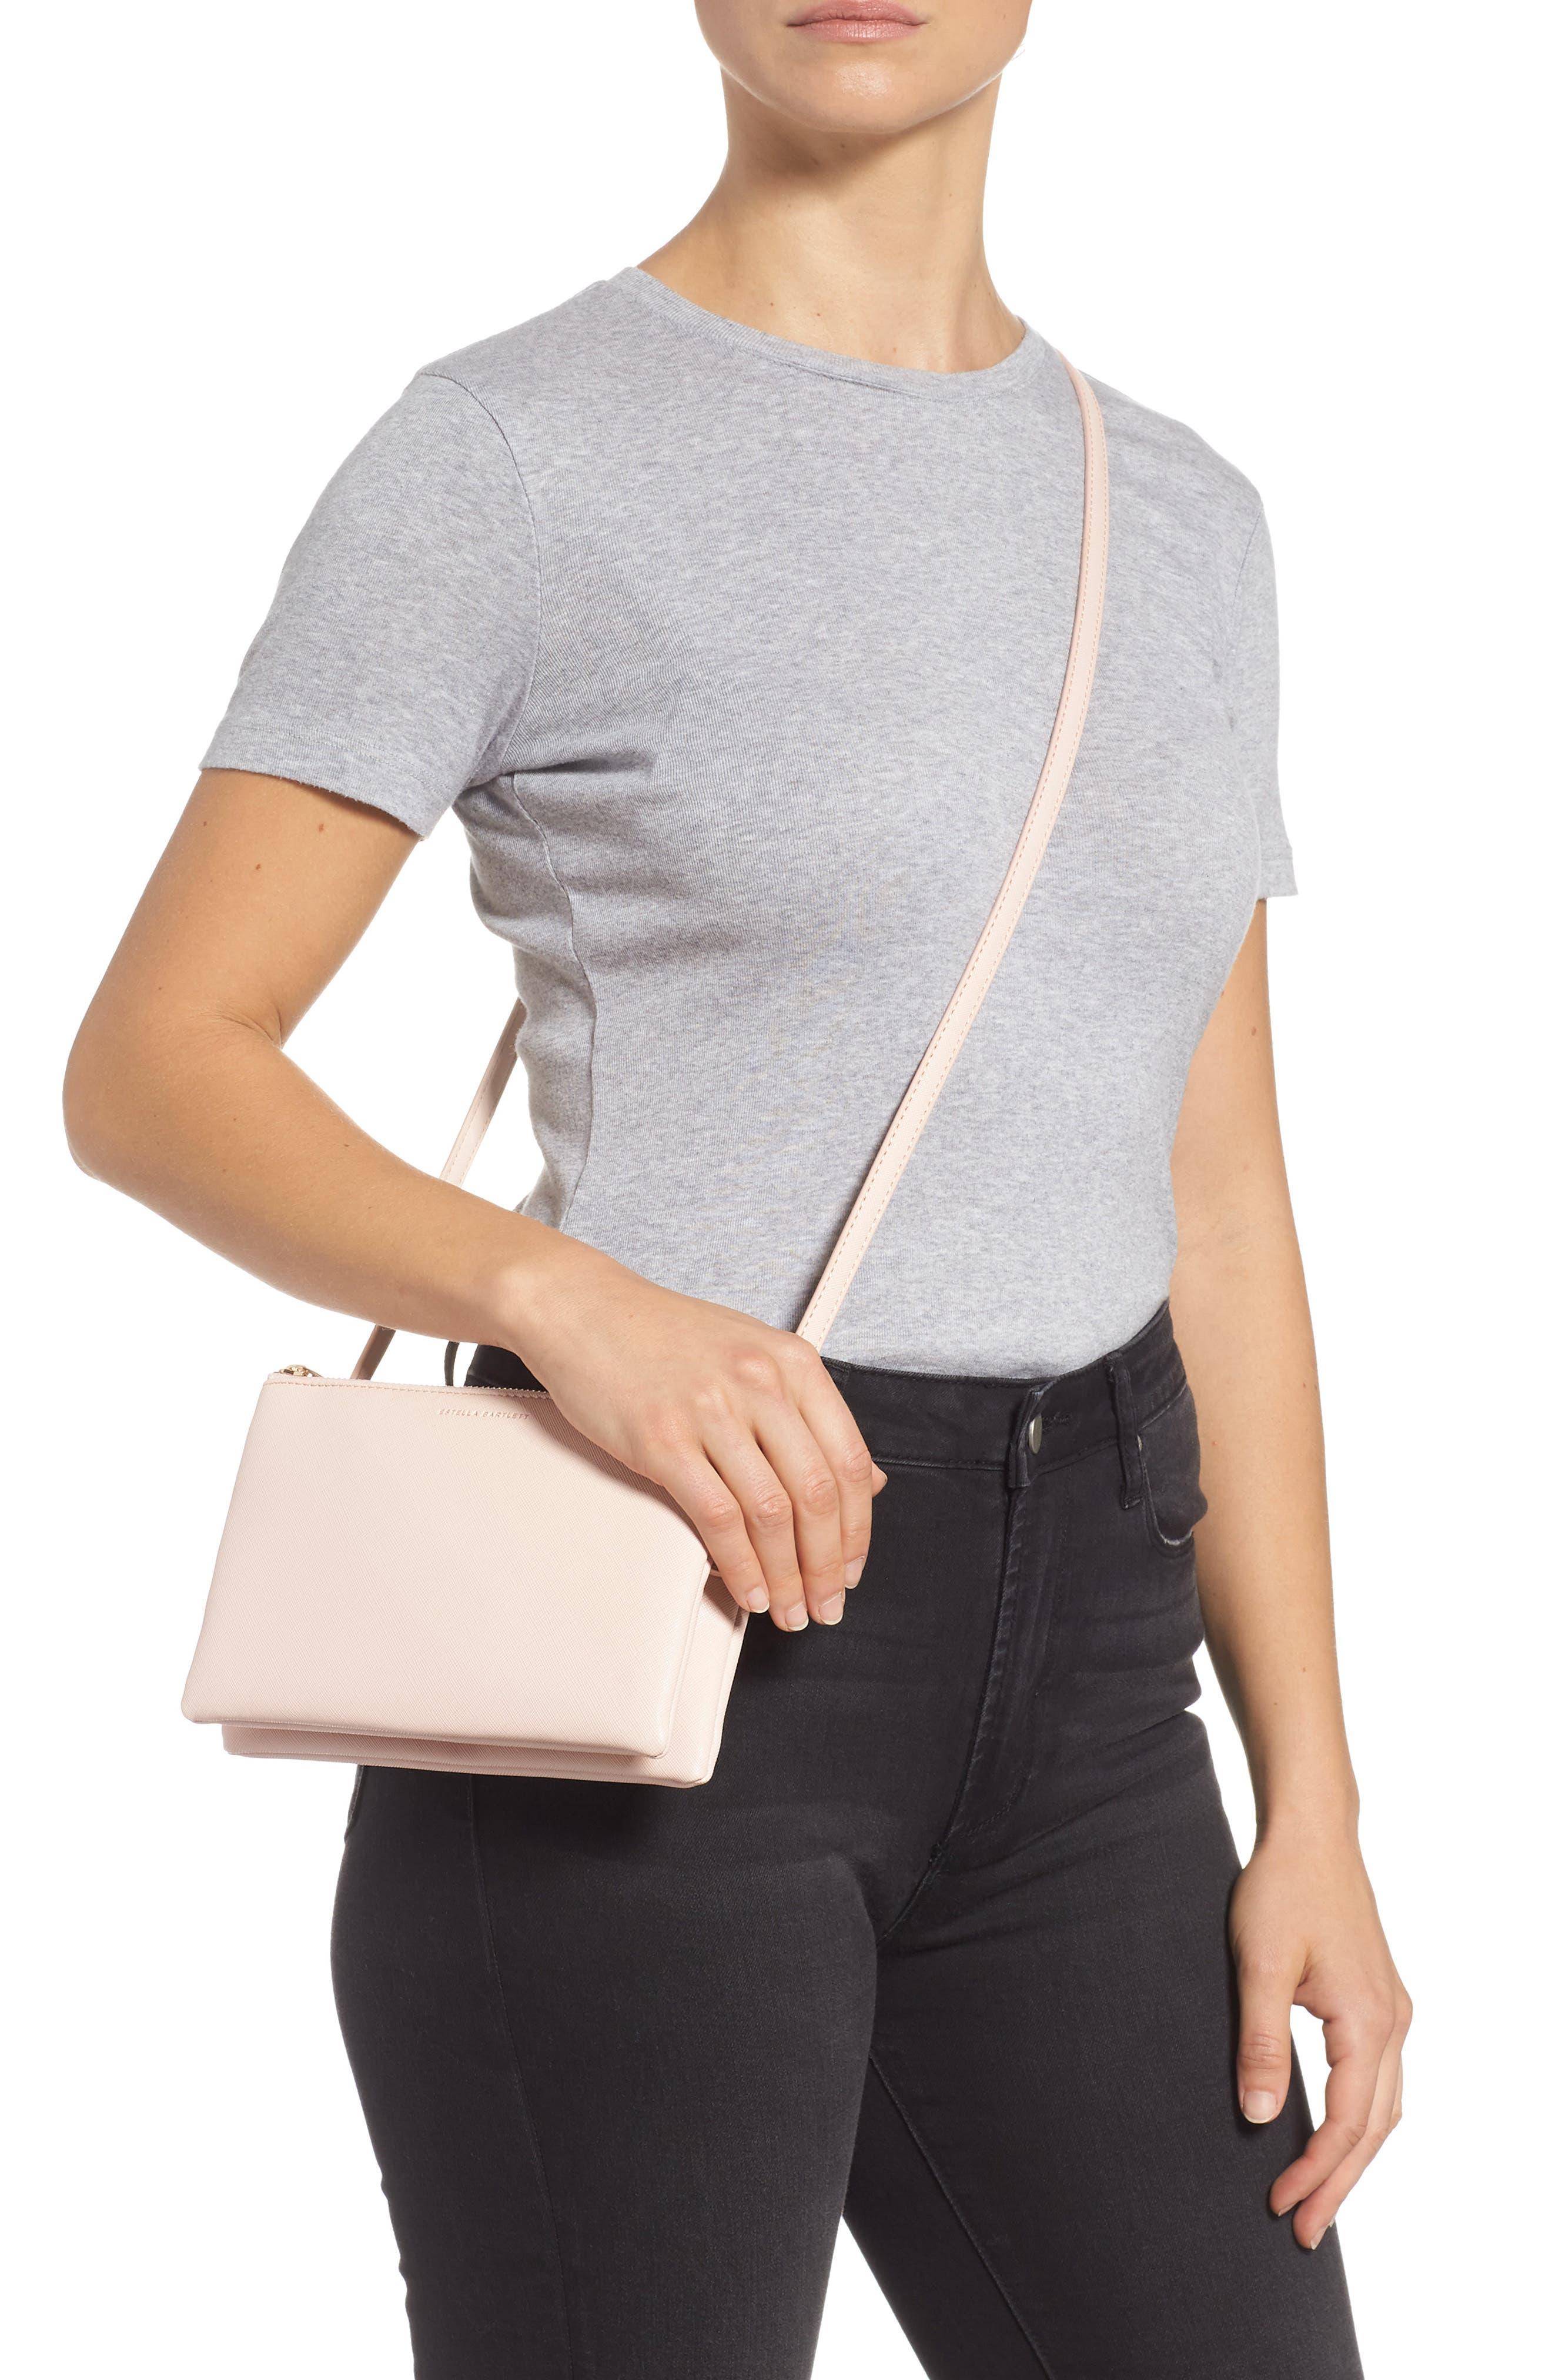 ESTELLA BARTLETT,                             Double Faux Leather Crossbody Bag,                             Alternate thumbnail 2, color,                             BLUSH